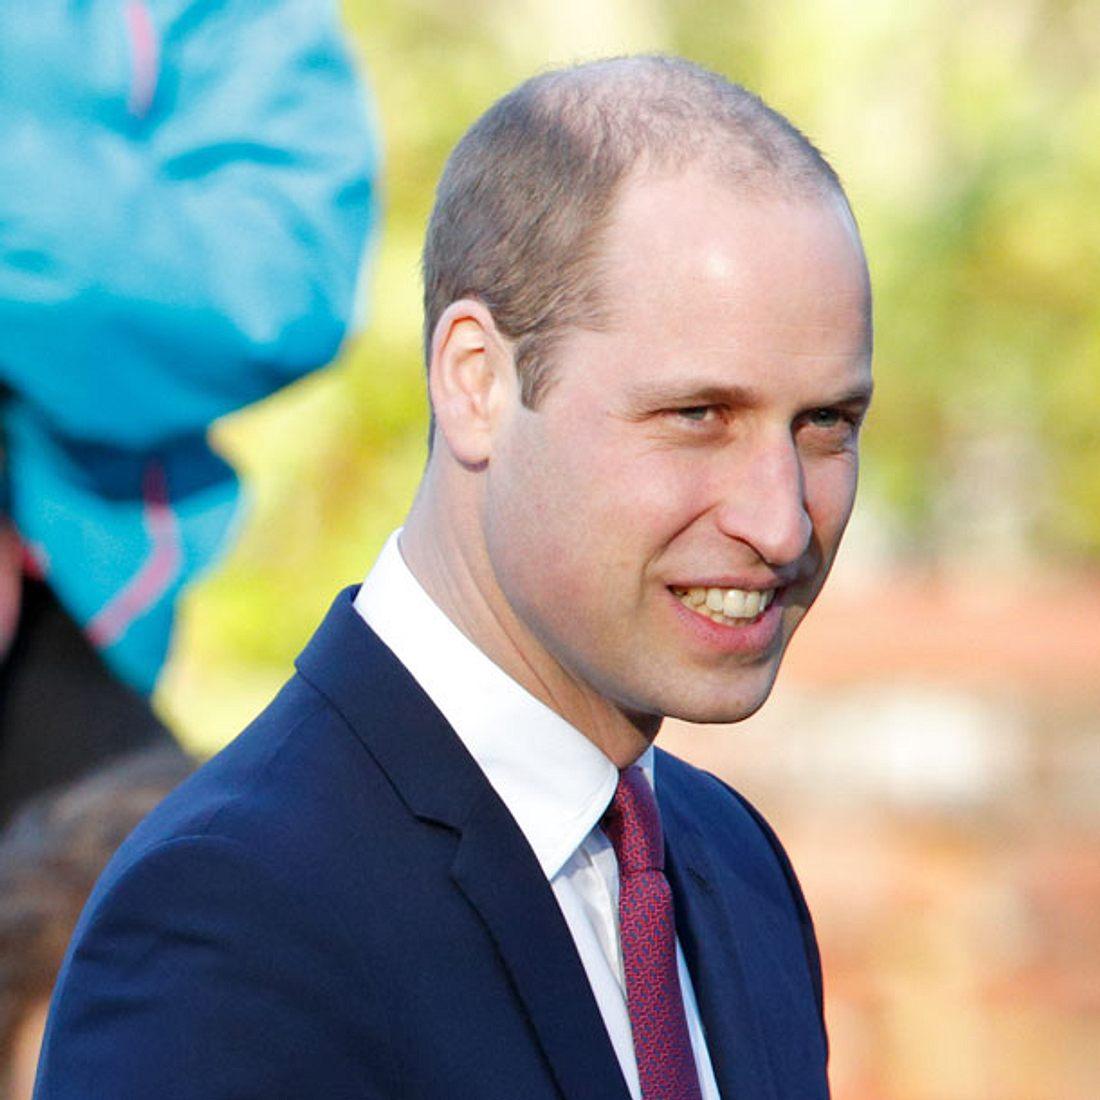 Prinz William zeigt seinen Kurzhaarschnitt